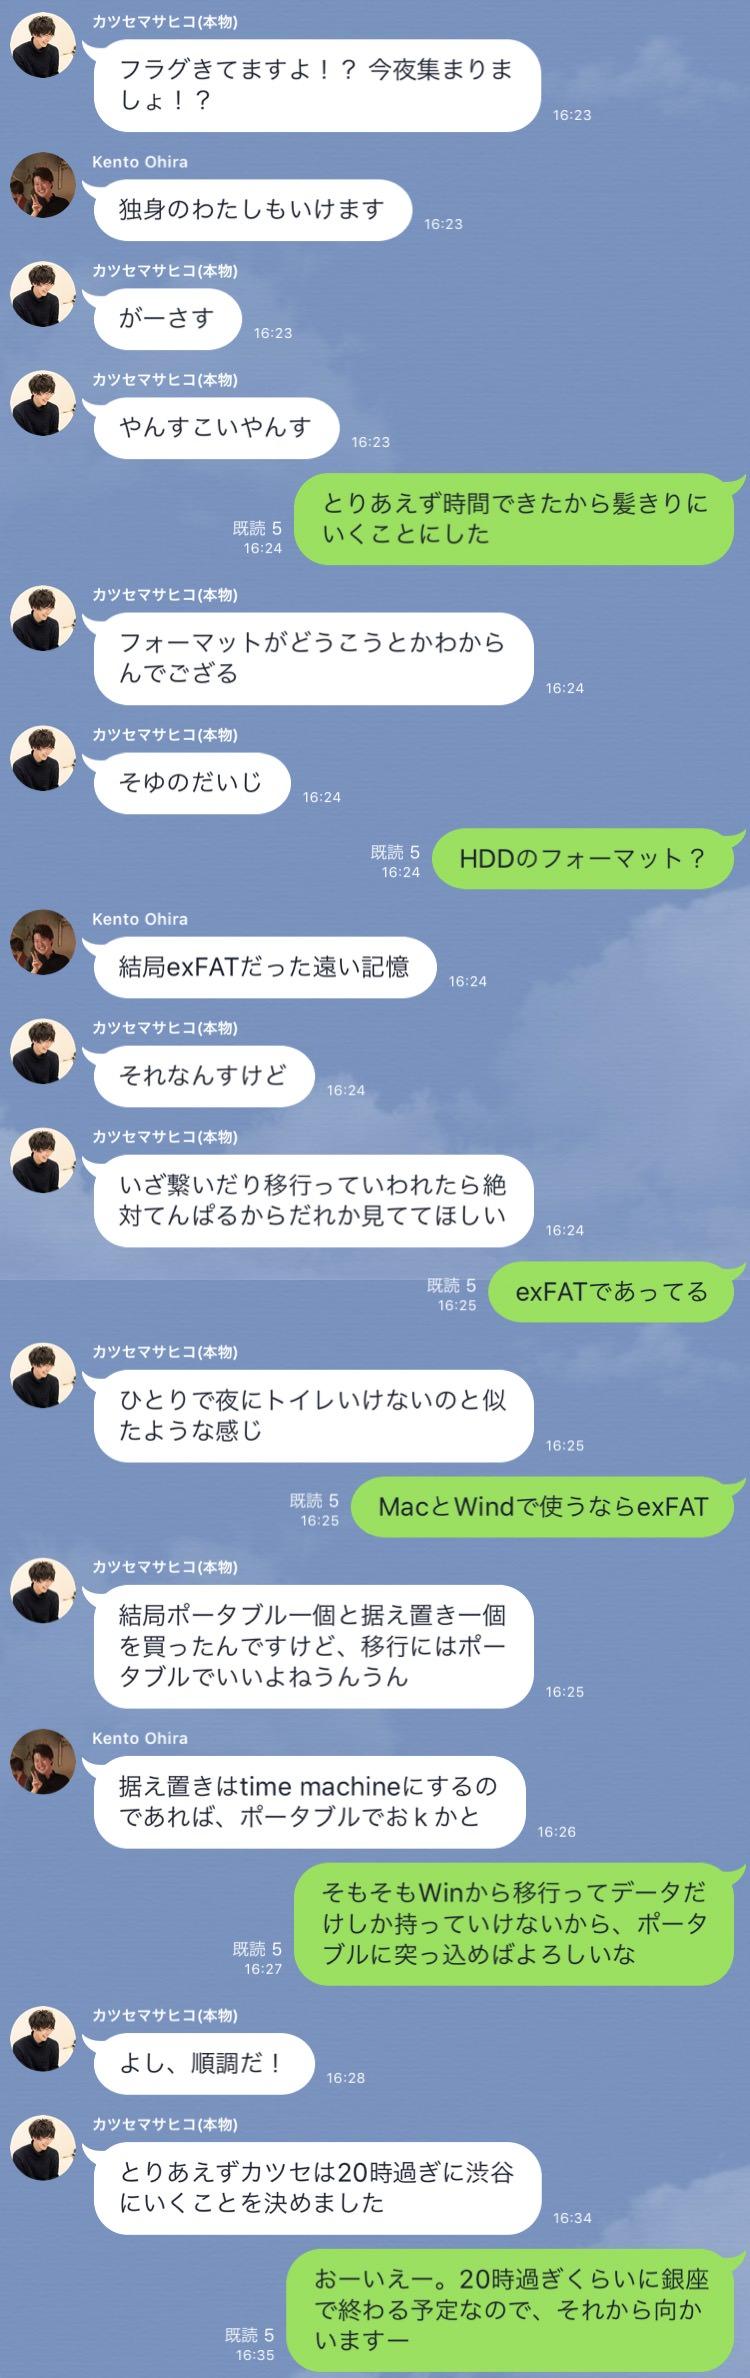 line-captcha-9